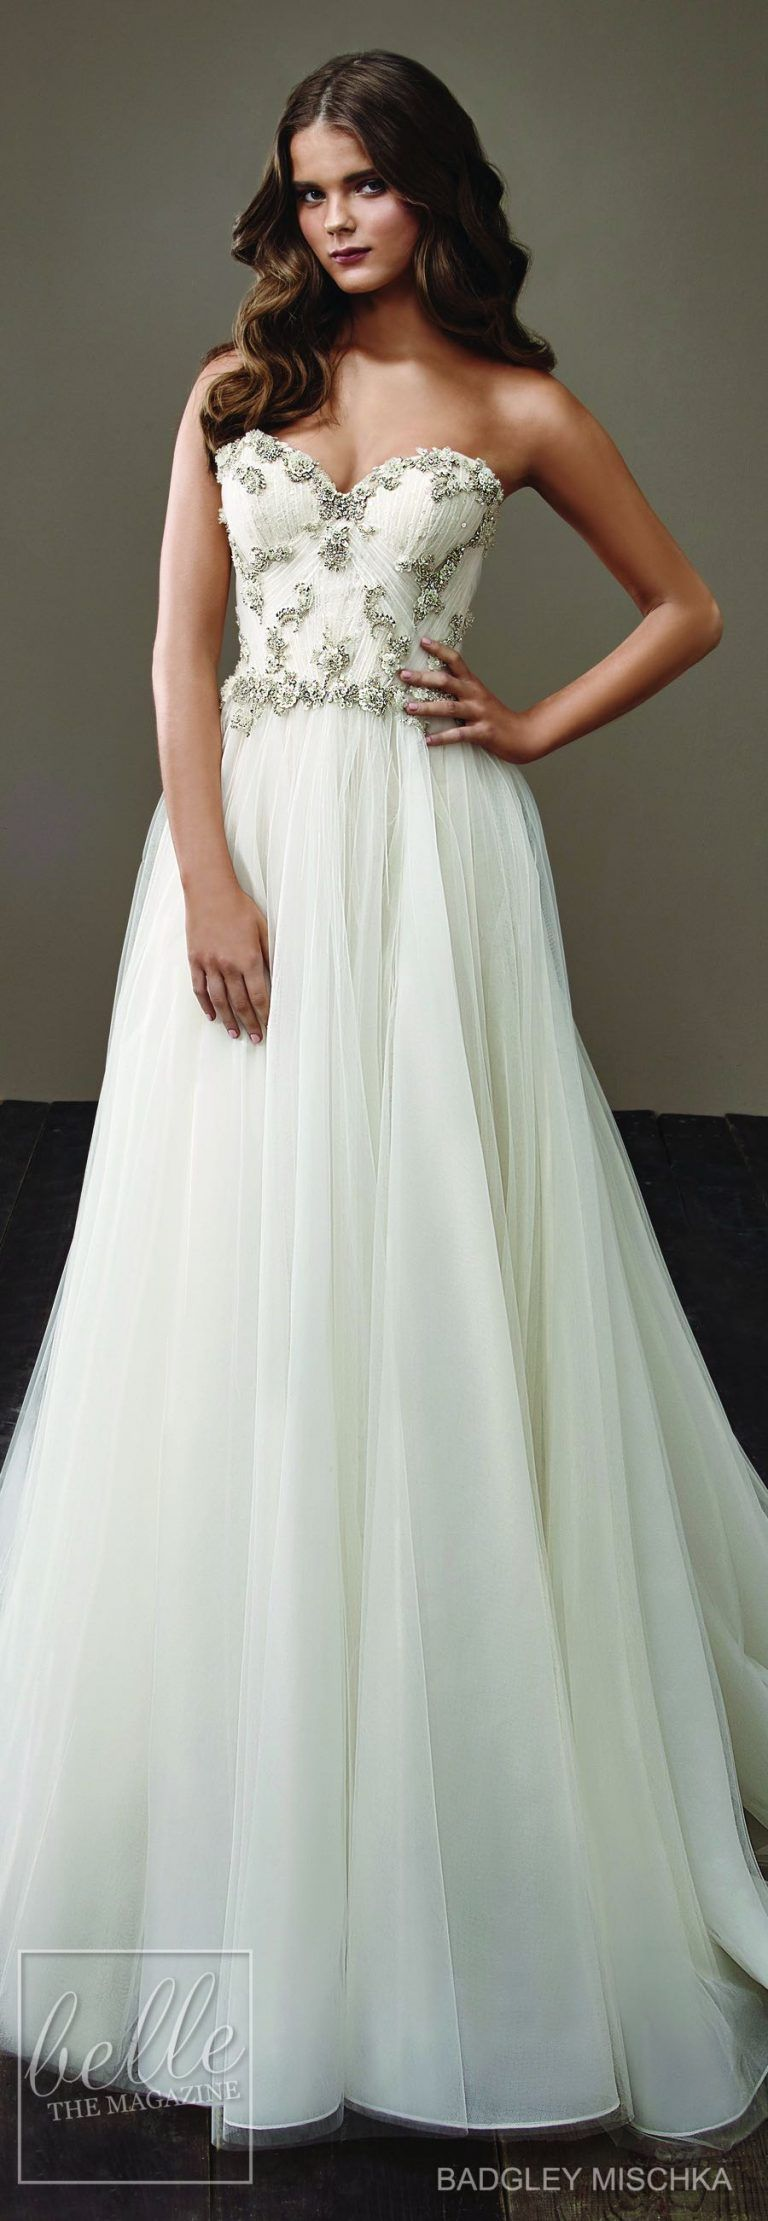 Badgley mischka bride wedding dress pinterest wedding